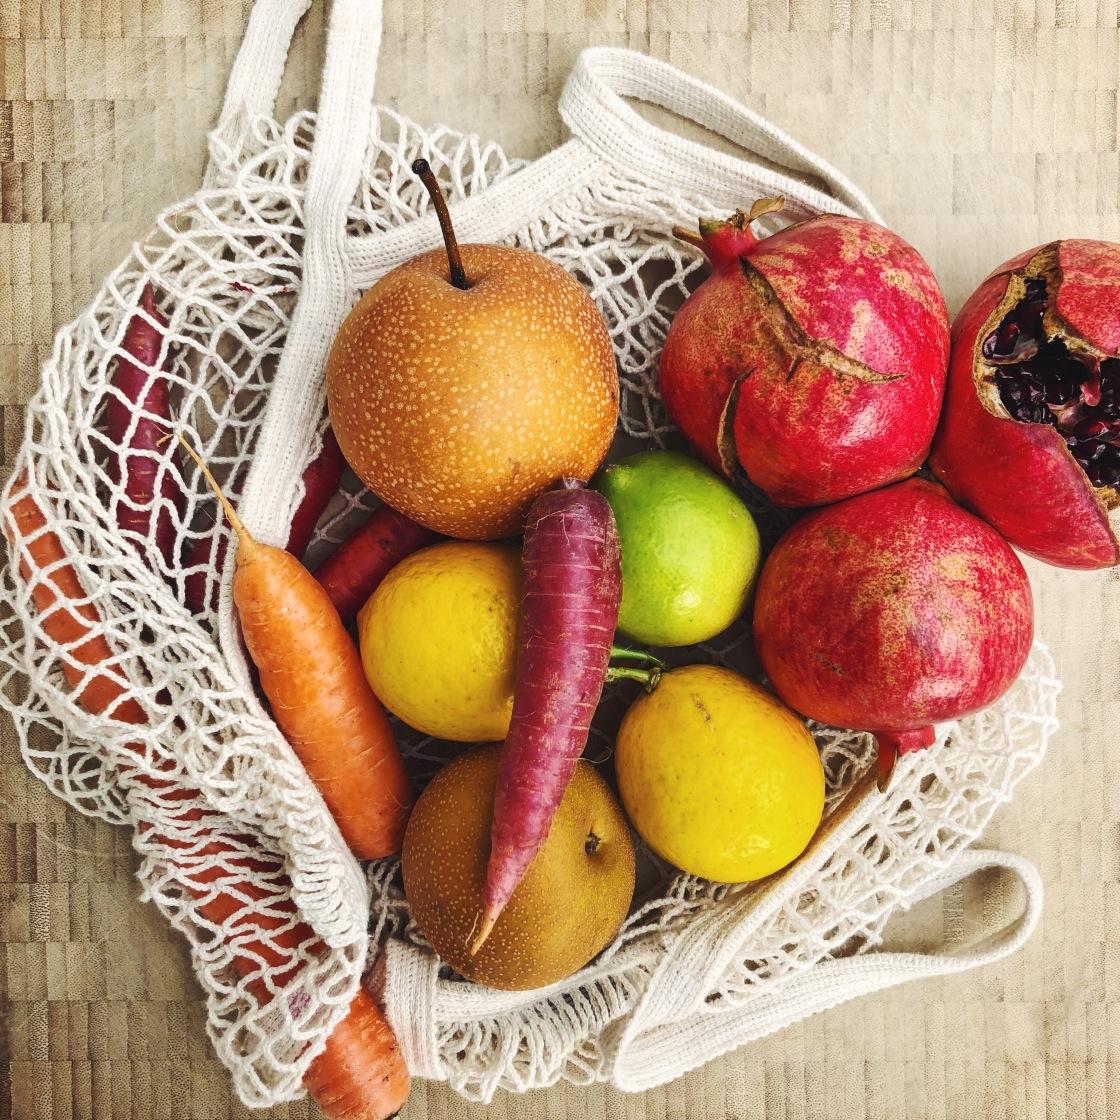 Meal plan vegan farmers market zero waste meal prep whole good plant based